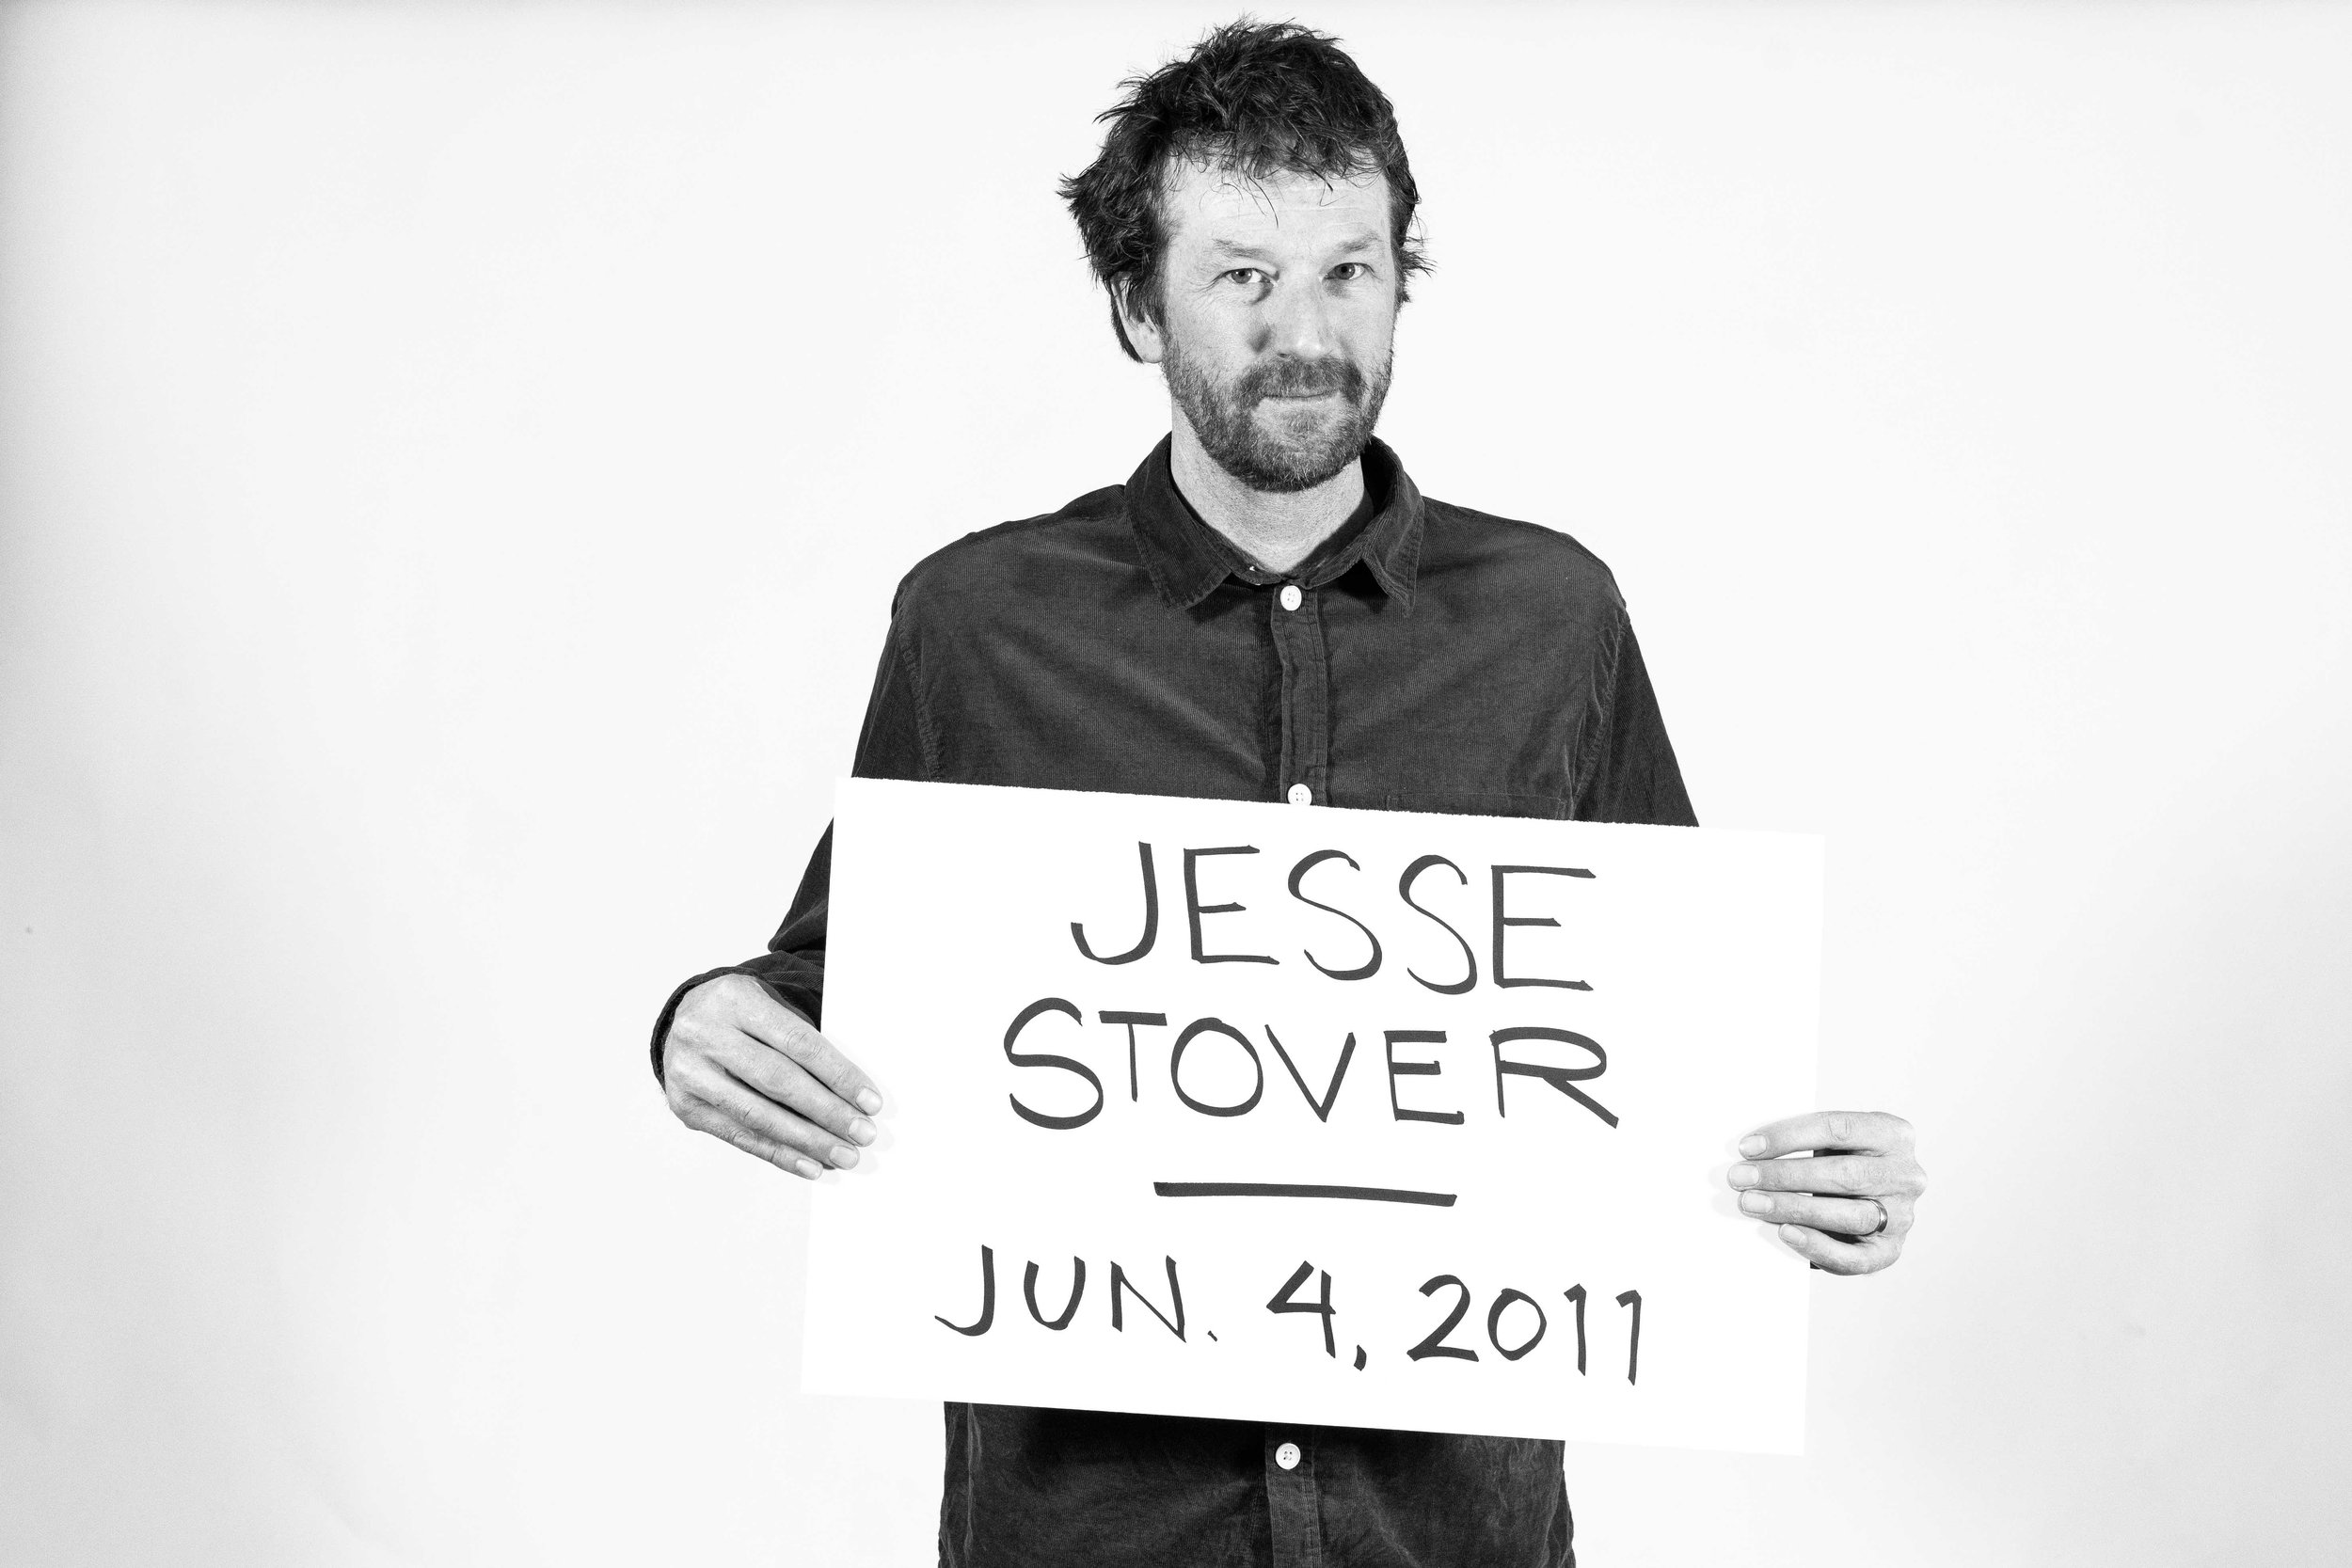 JesseStover-6.jpg